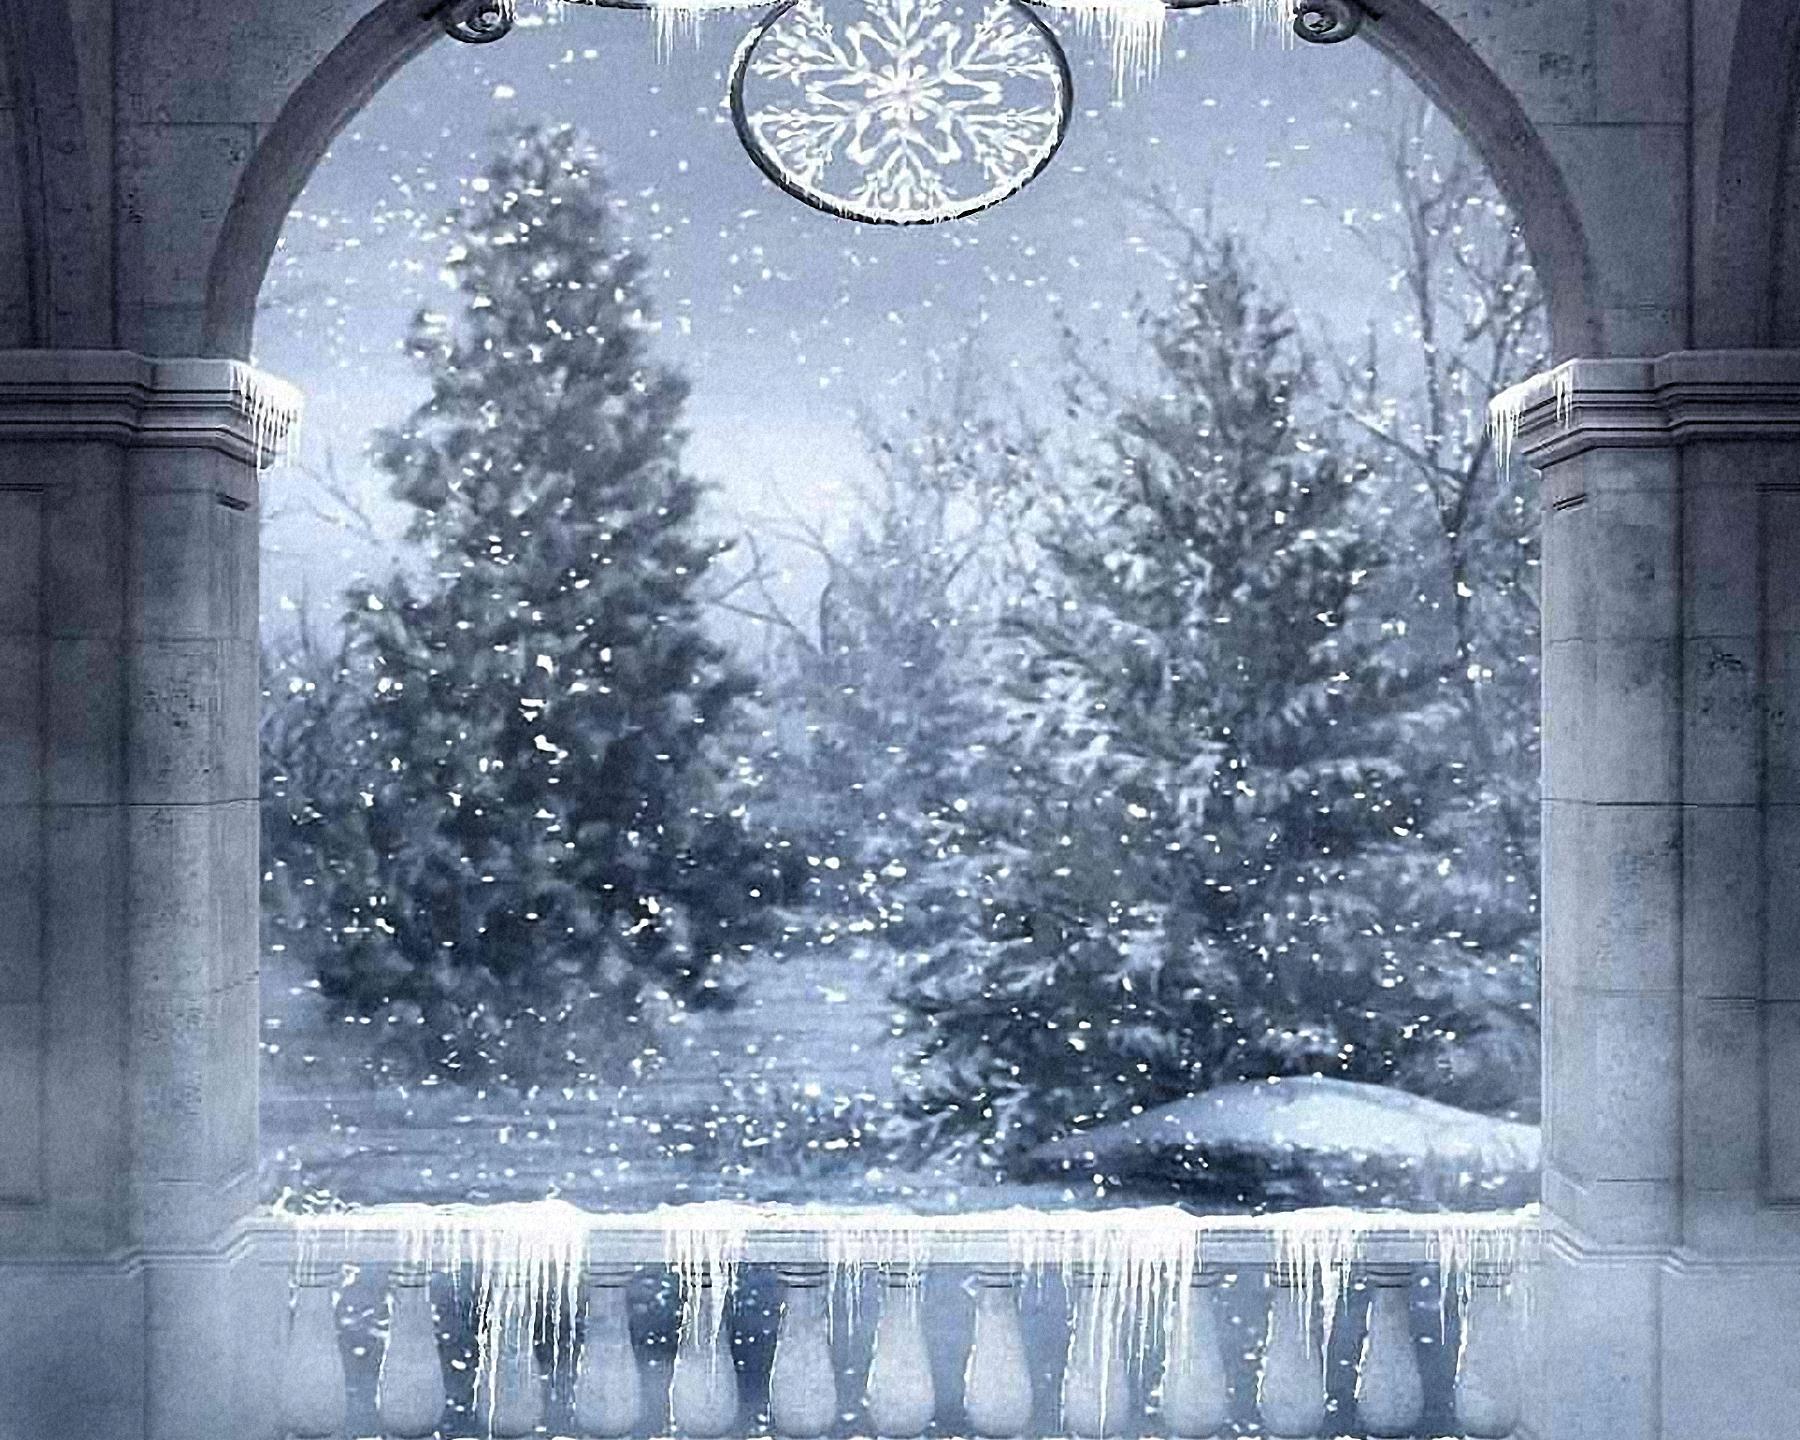 Snowy Arch Christmas Backdrop Rental